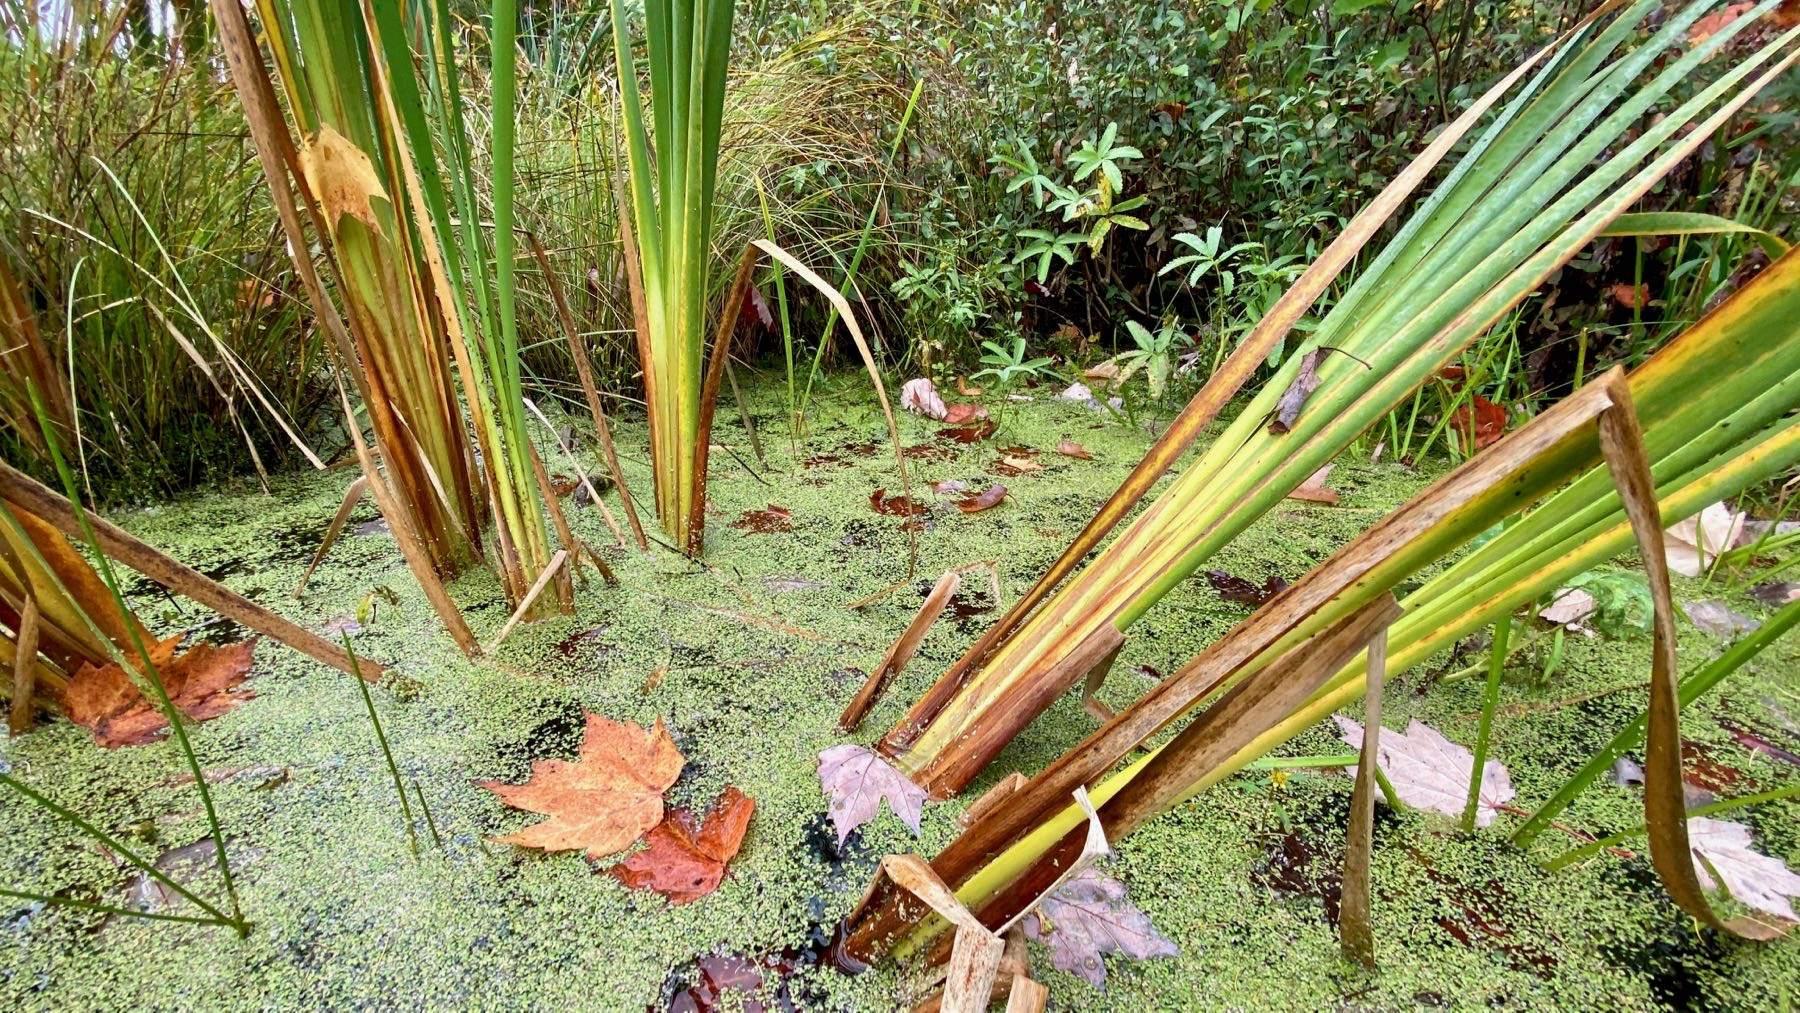 Swamp ditch